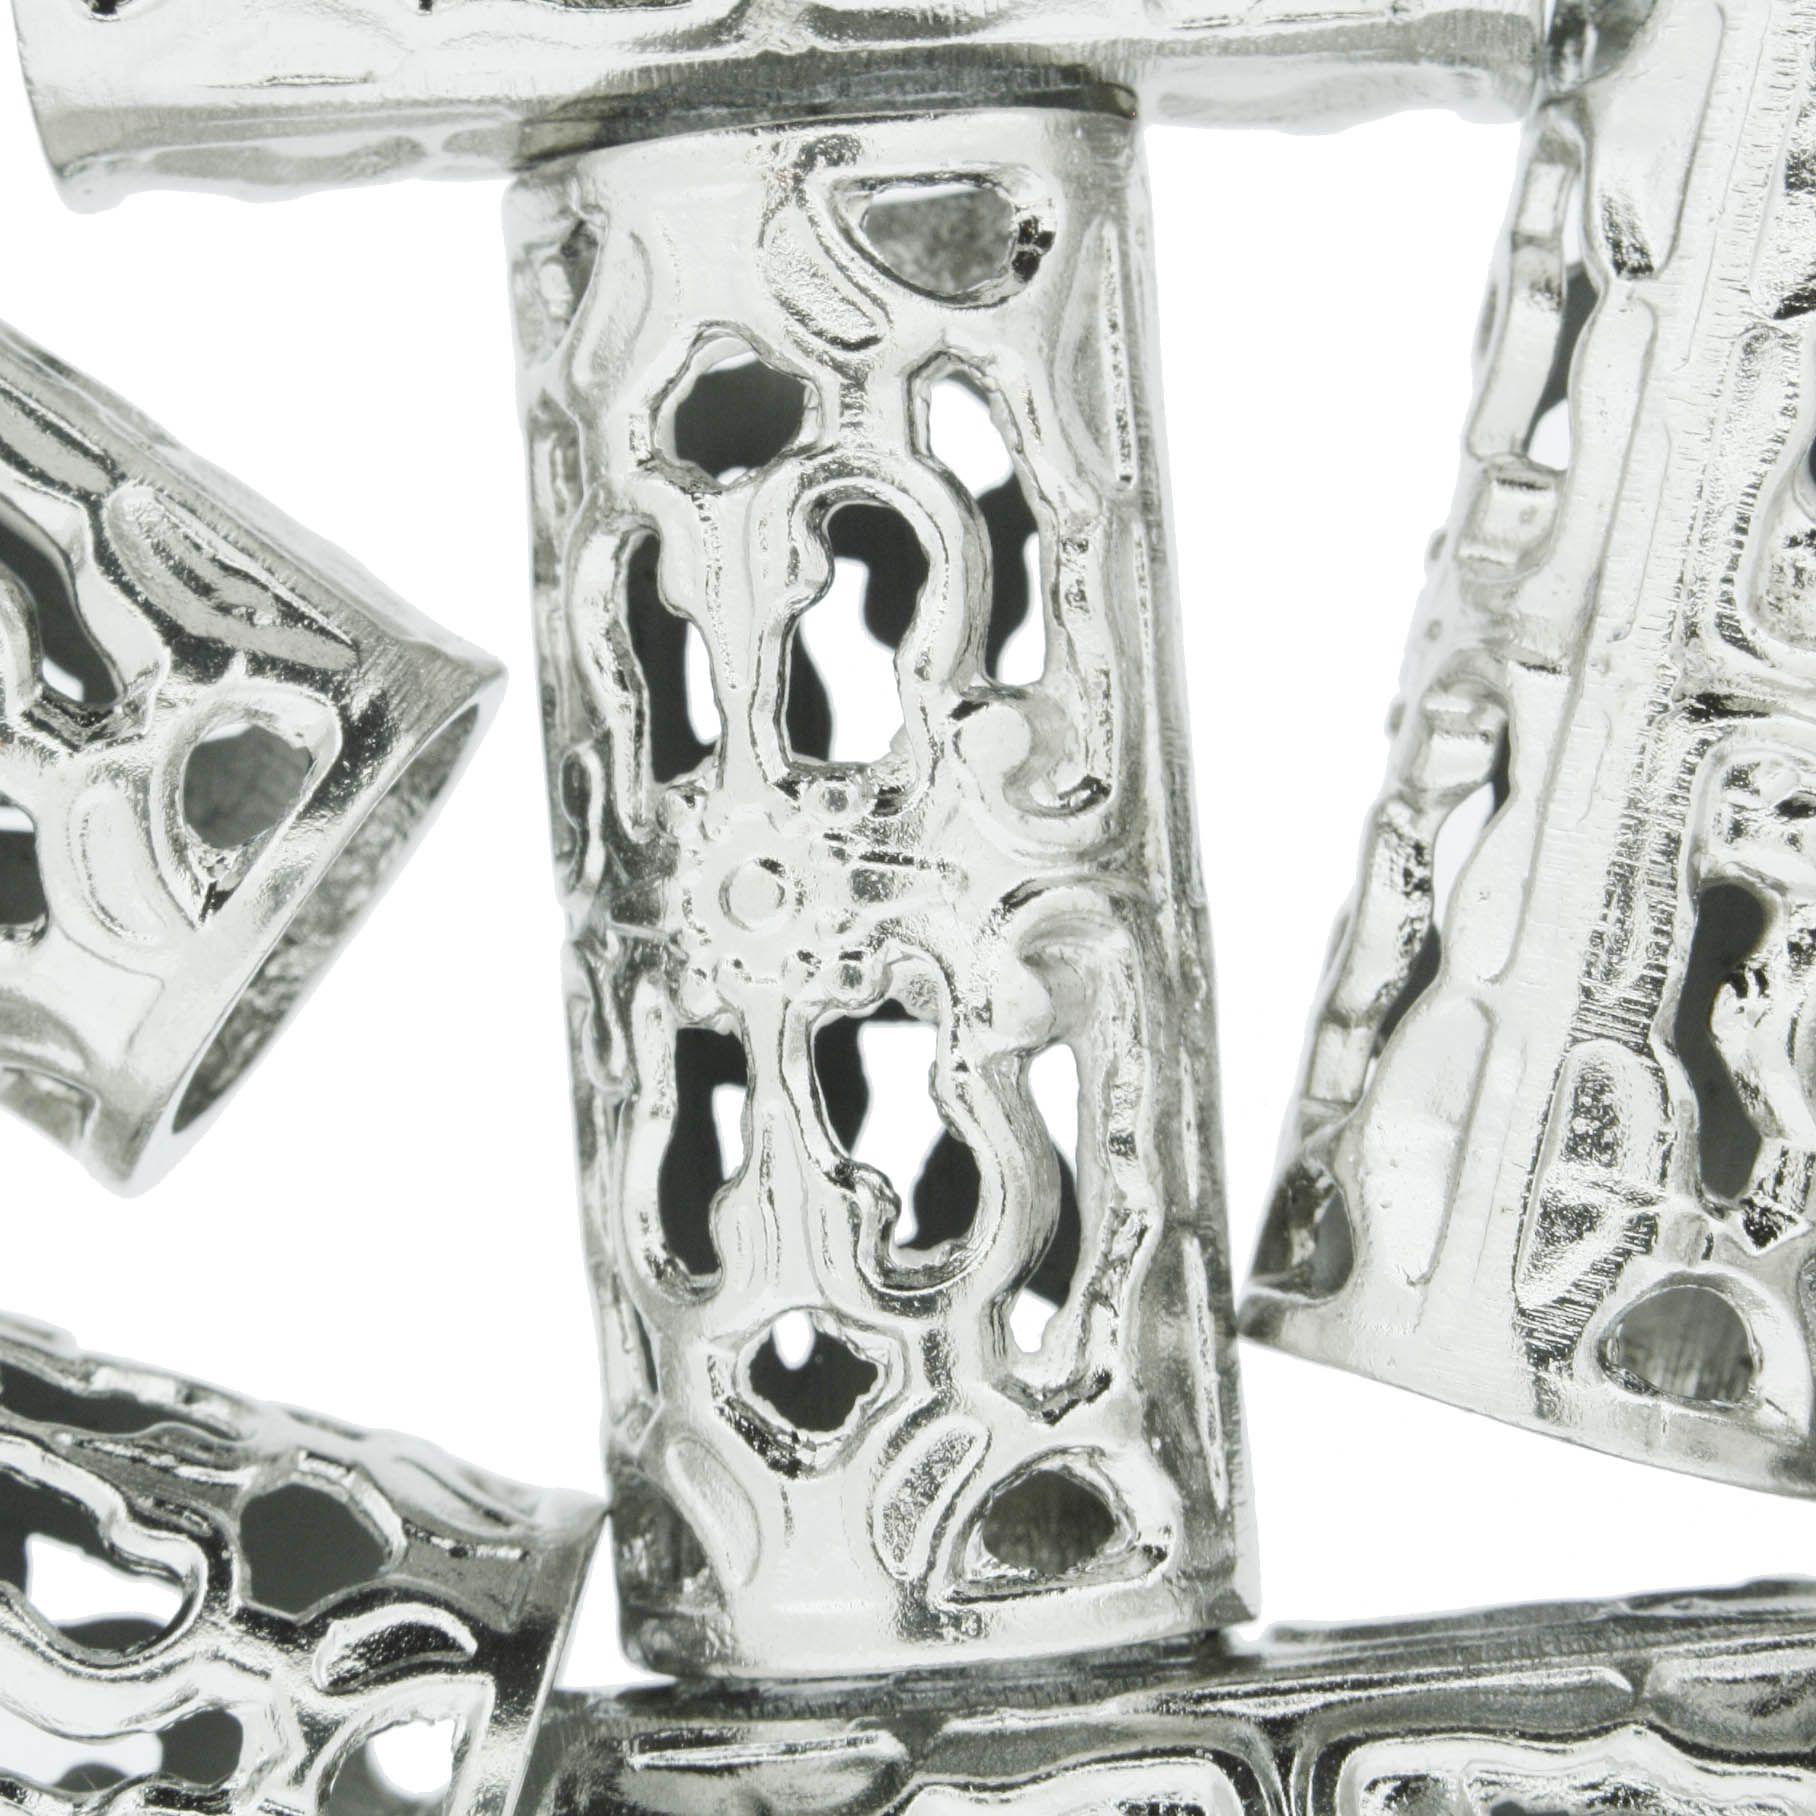 Firma de Metal - Níquel - 40mm  - Stéphanie Bijoux® - Peças para Bijuterias e Artesanato